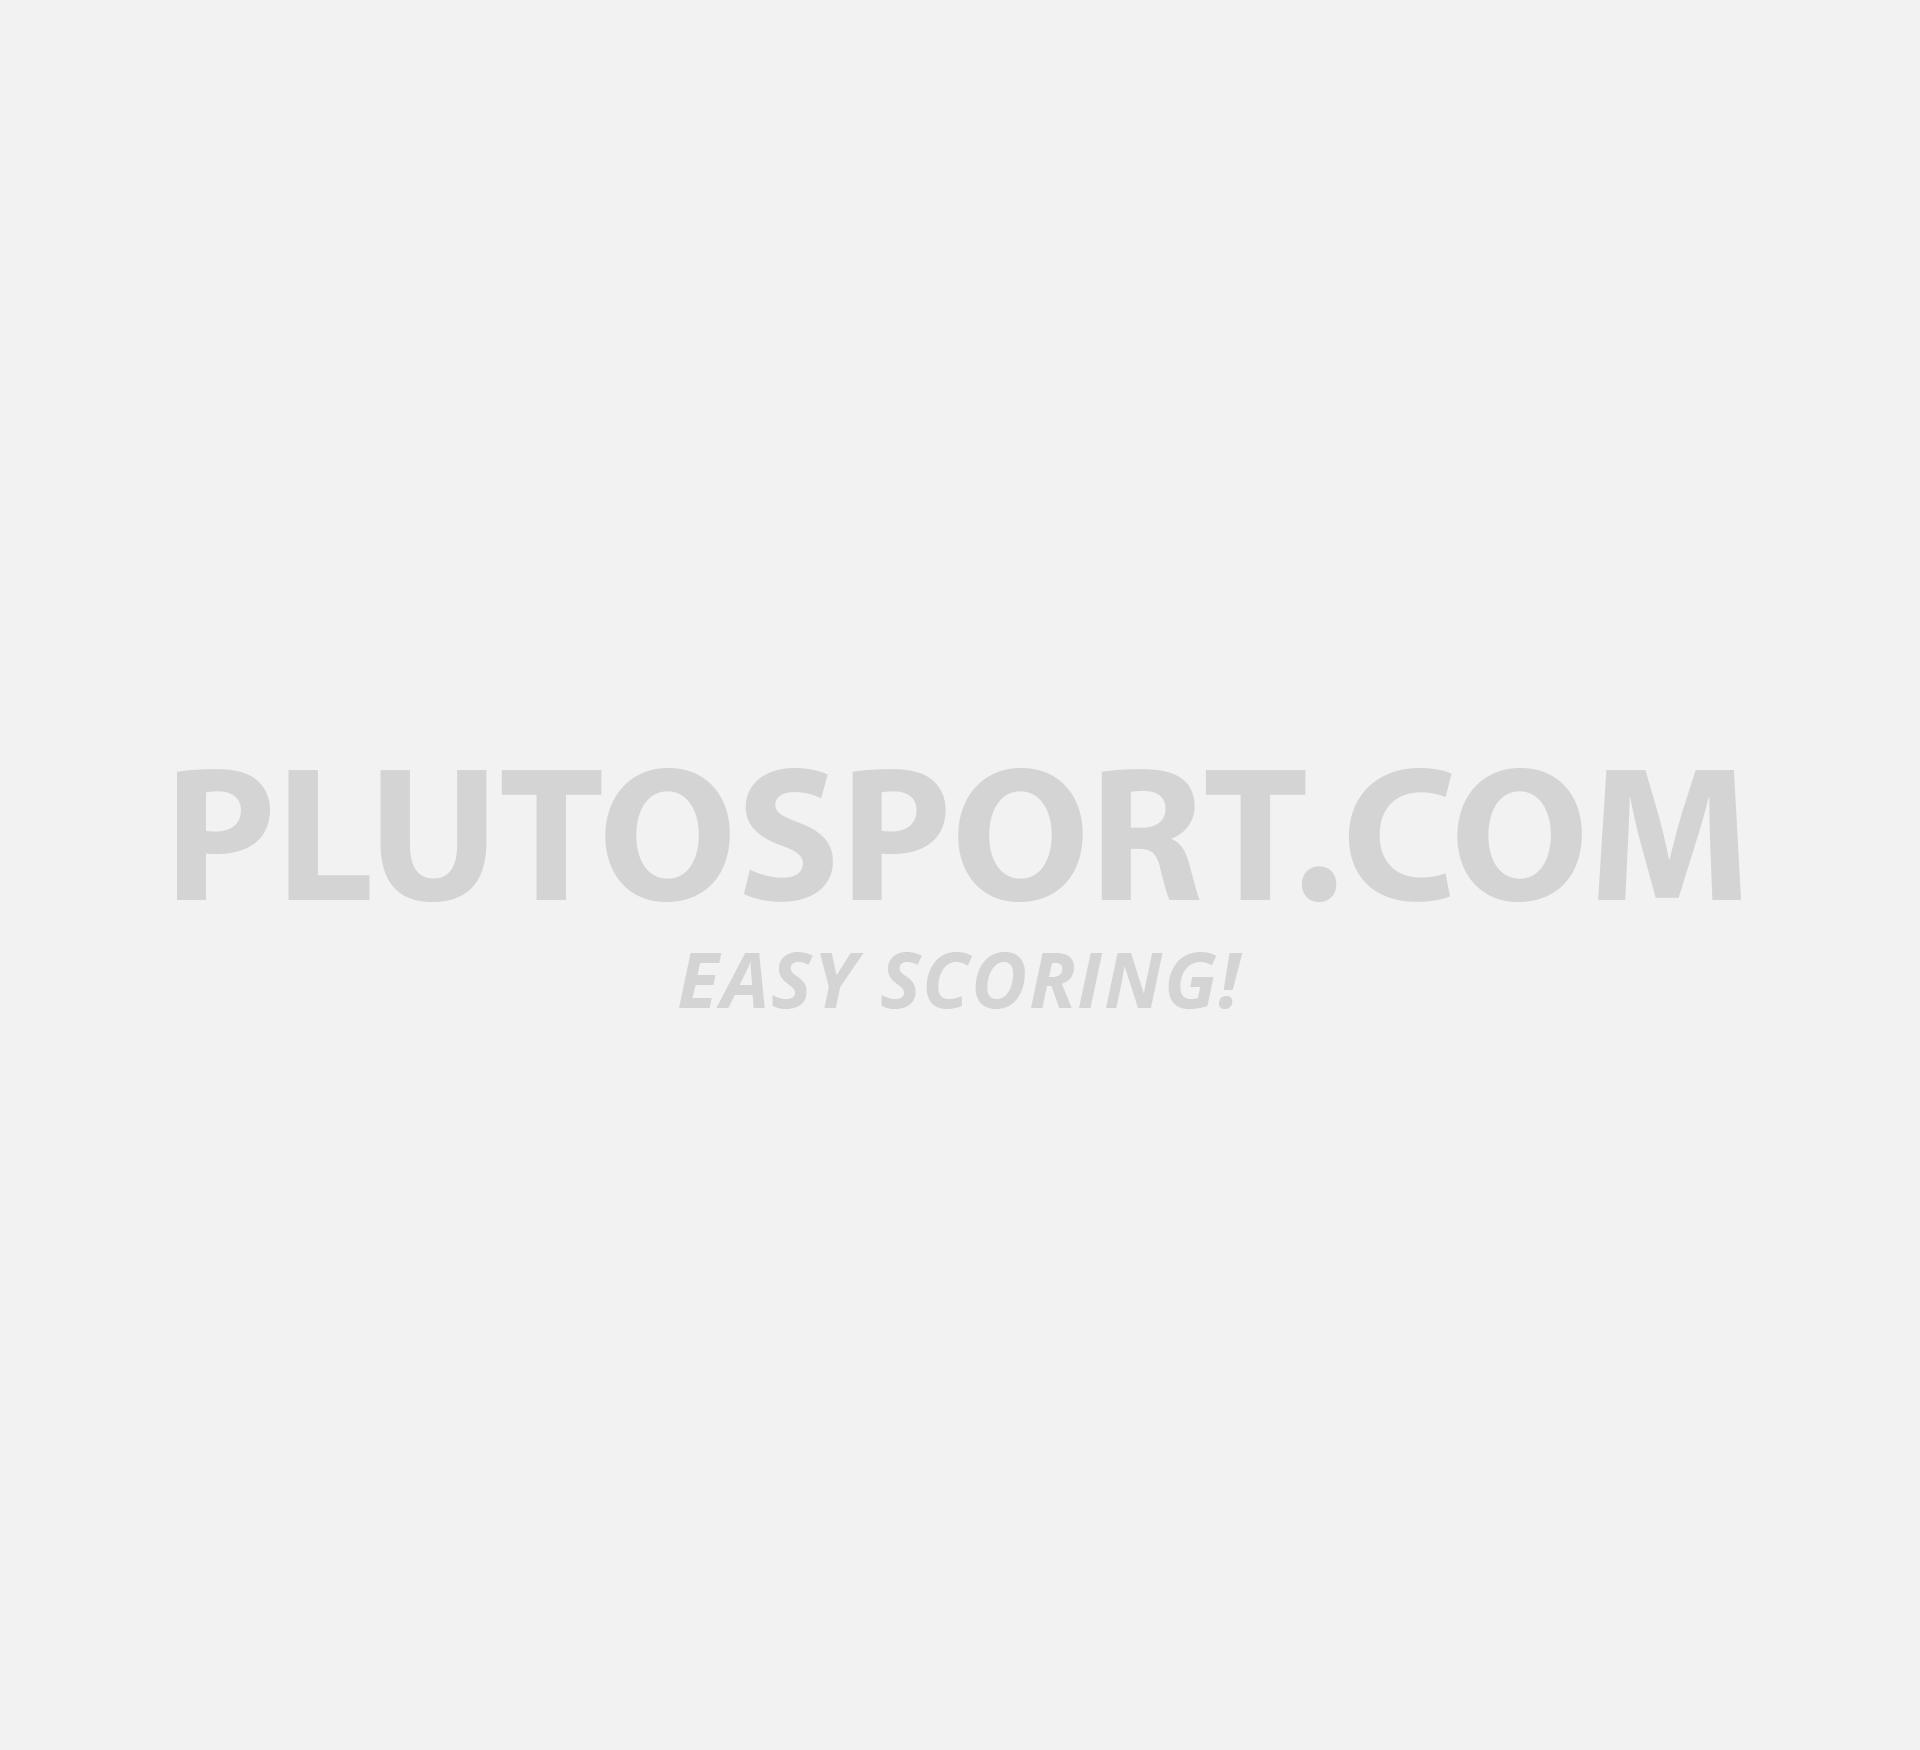 1e4a5acd79f2 Adidas Response Short Mens - Shorts - Clothing - Tennis - Sports ...